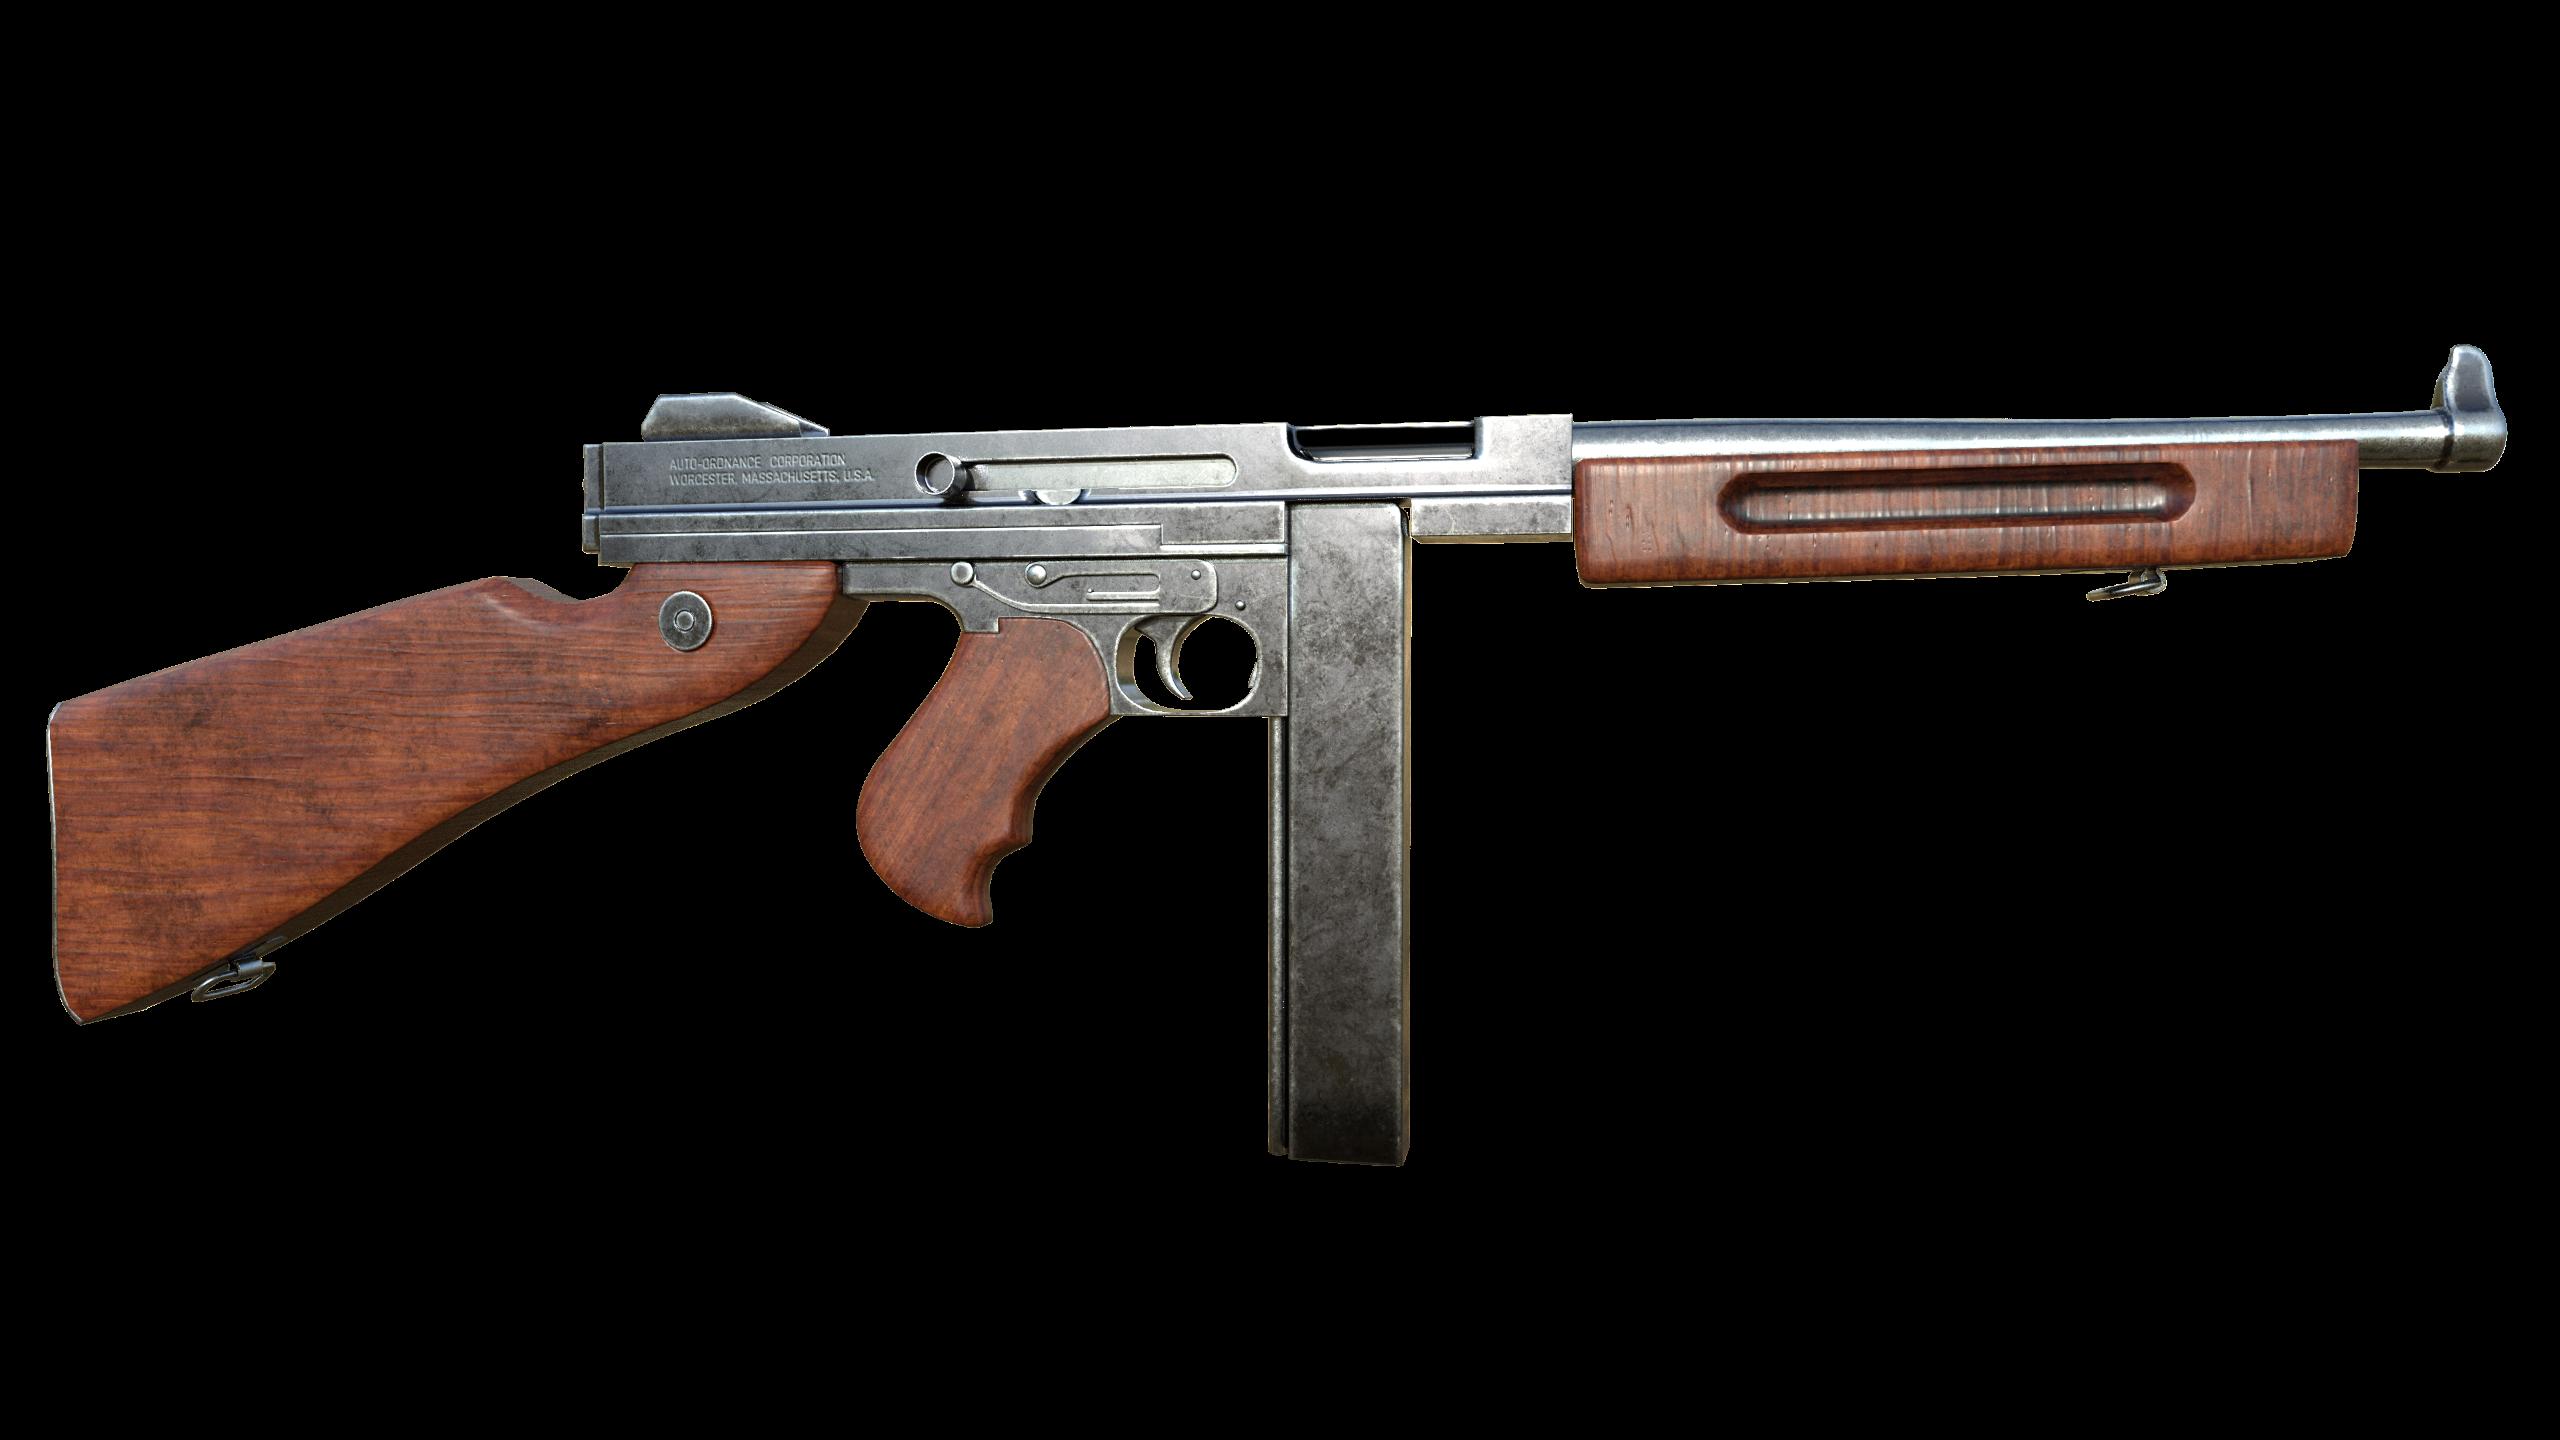 Thompson M1A1 image - dyotomi - Mod DB